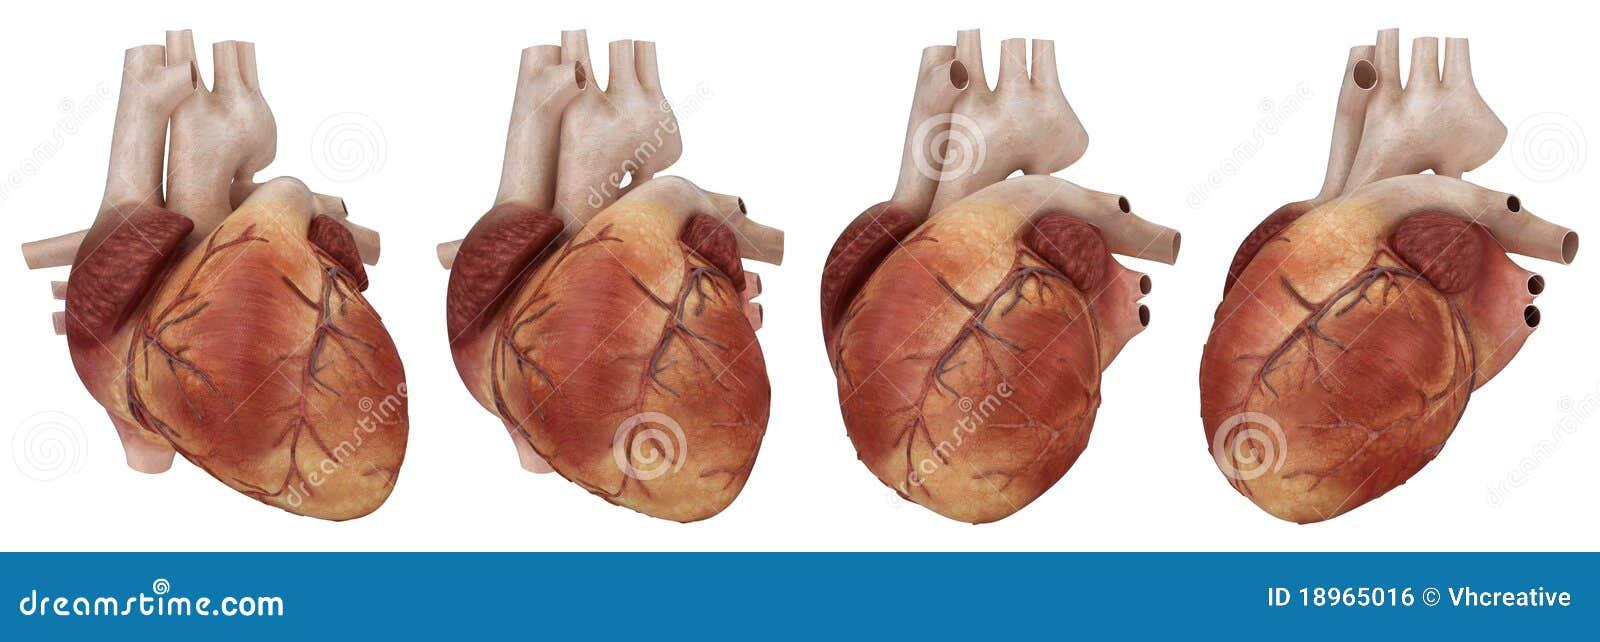 Cuore umano ed arterie coronarie